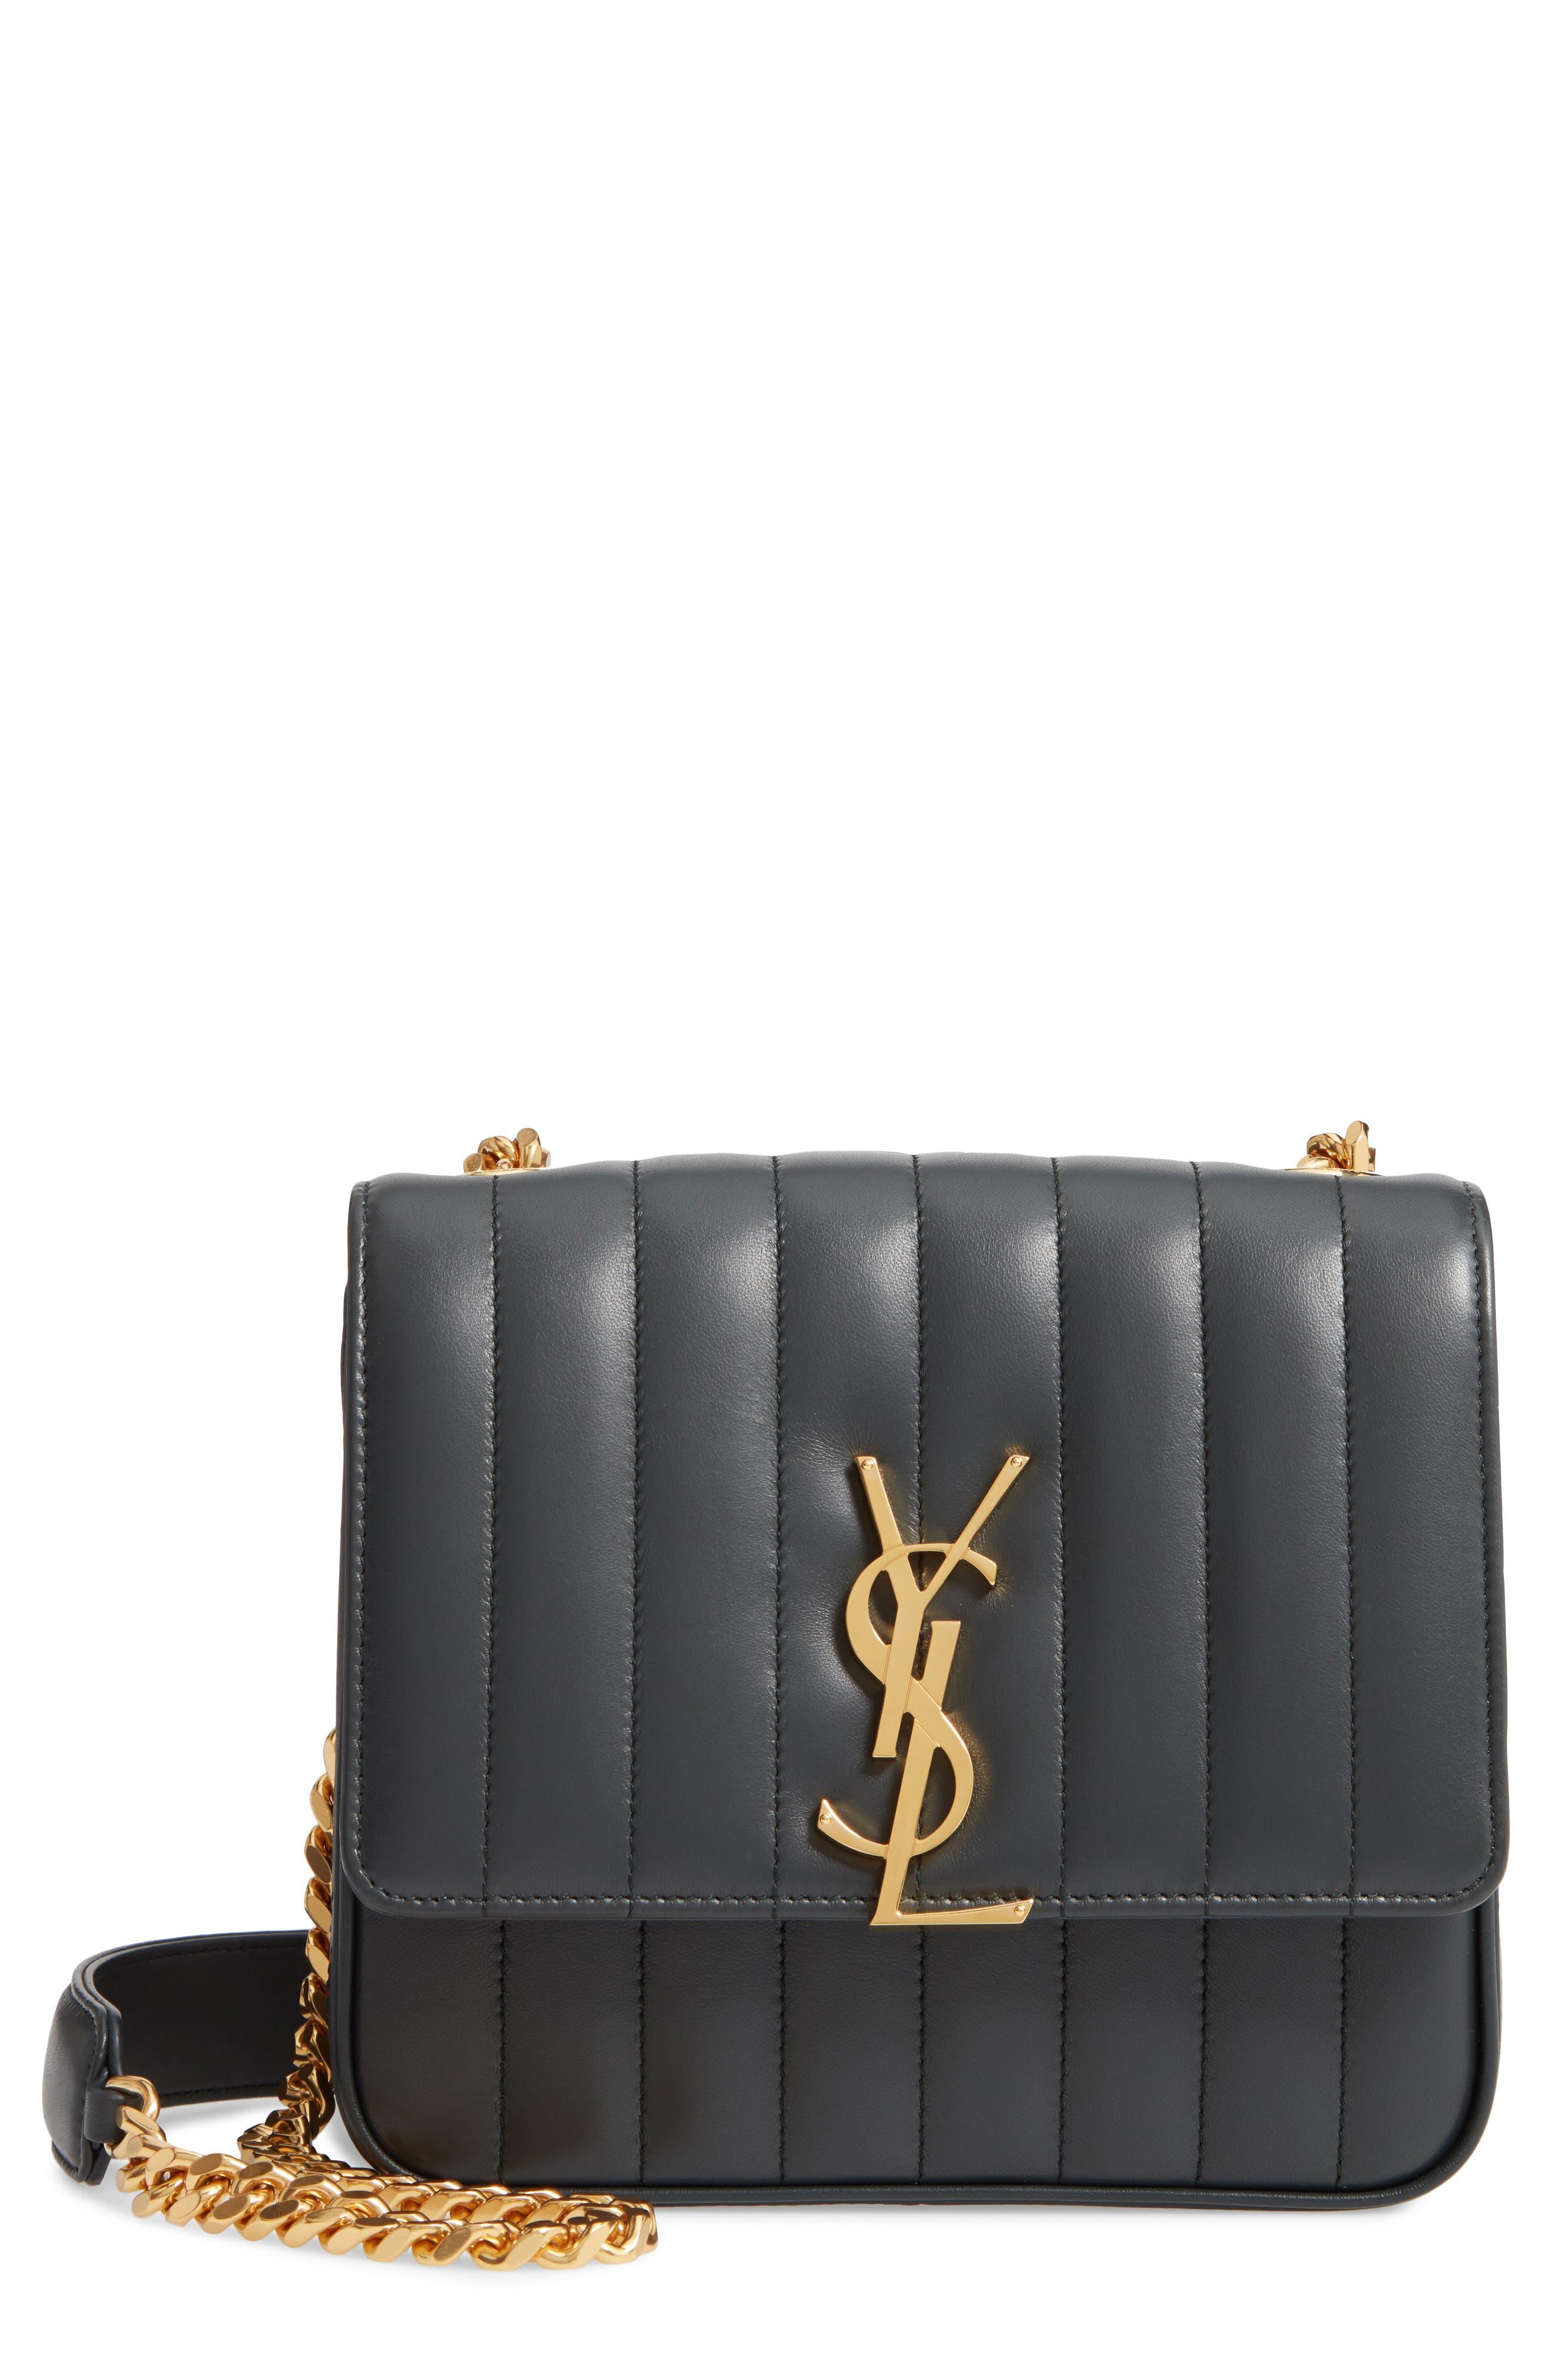 Medium Vicky Leather Crossbody Bag,                             Main thumbnail 1, color,                             ALGAE